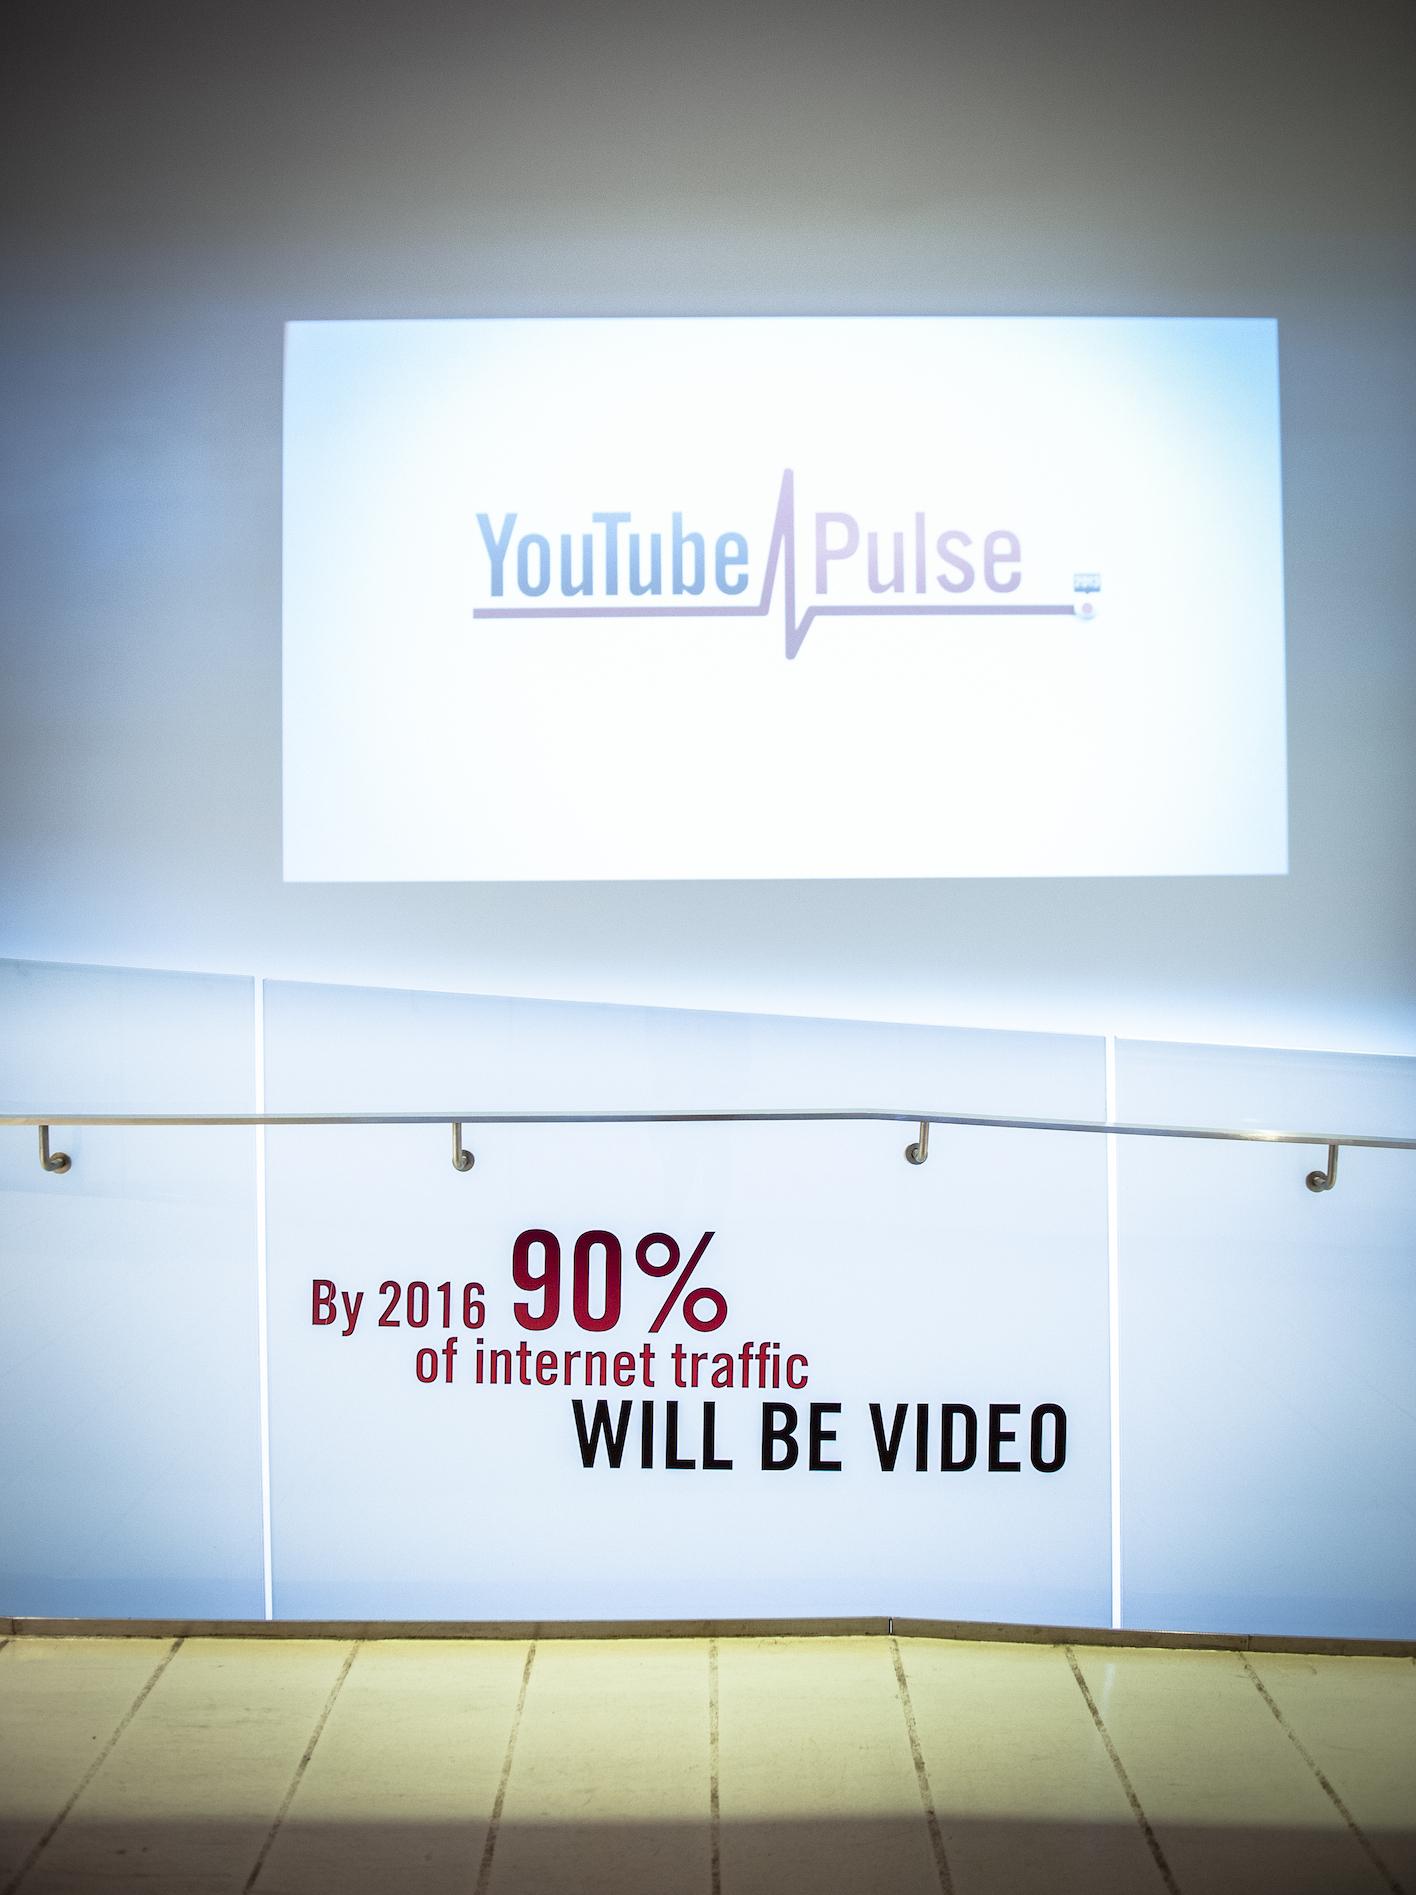 youtube_pulse_gs_ktchn-3-Edited.jpg